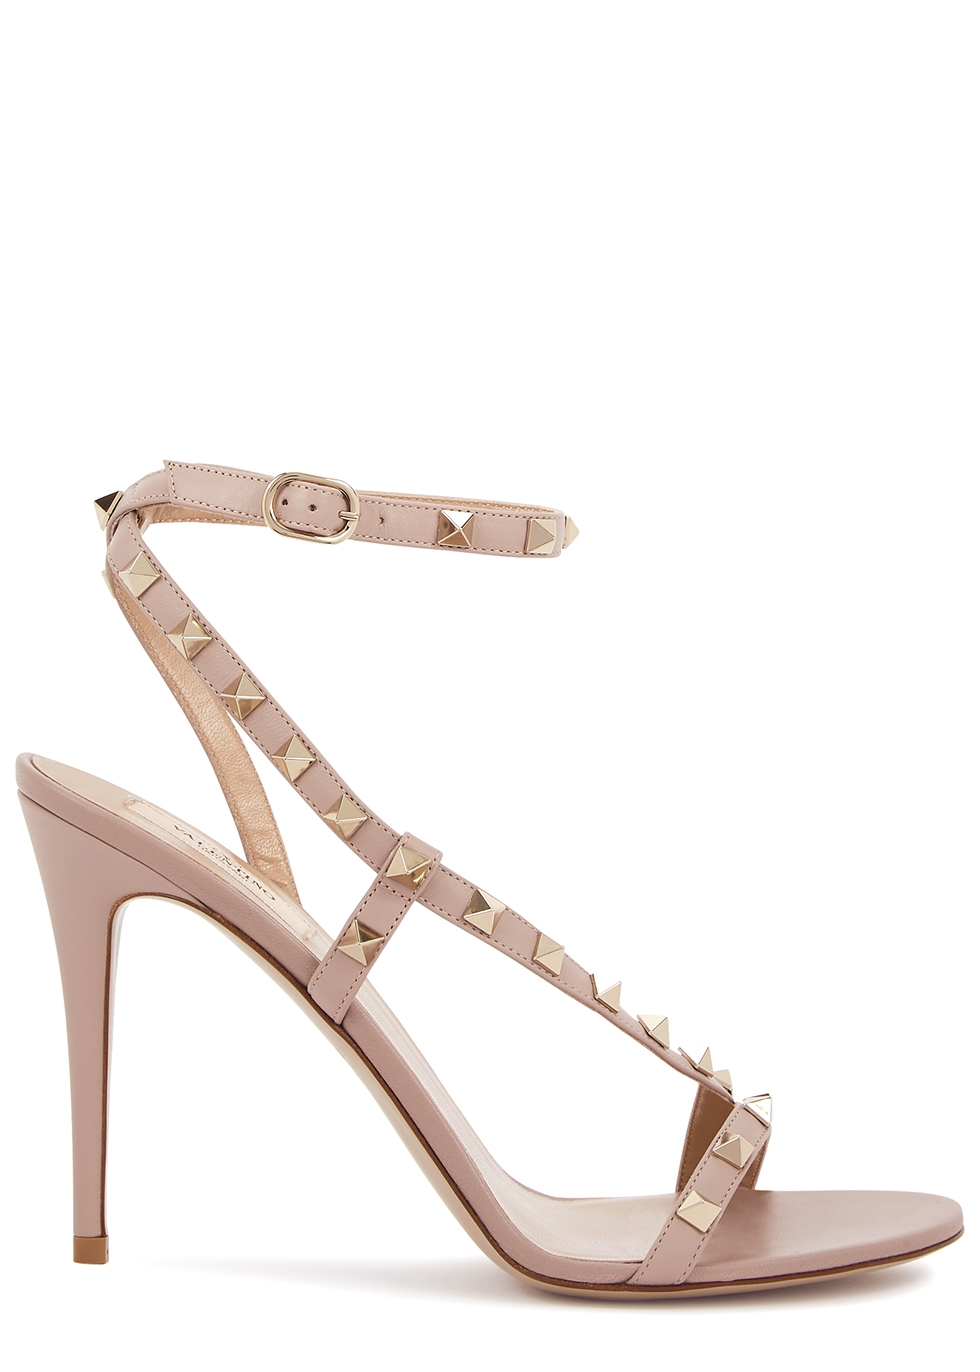 Valentino Garavani Rockstud 100 blush leather sandals